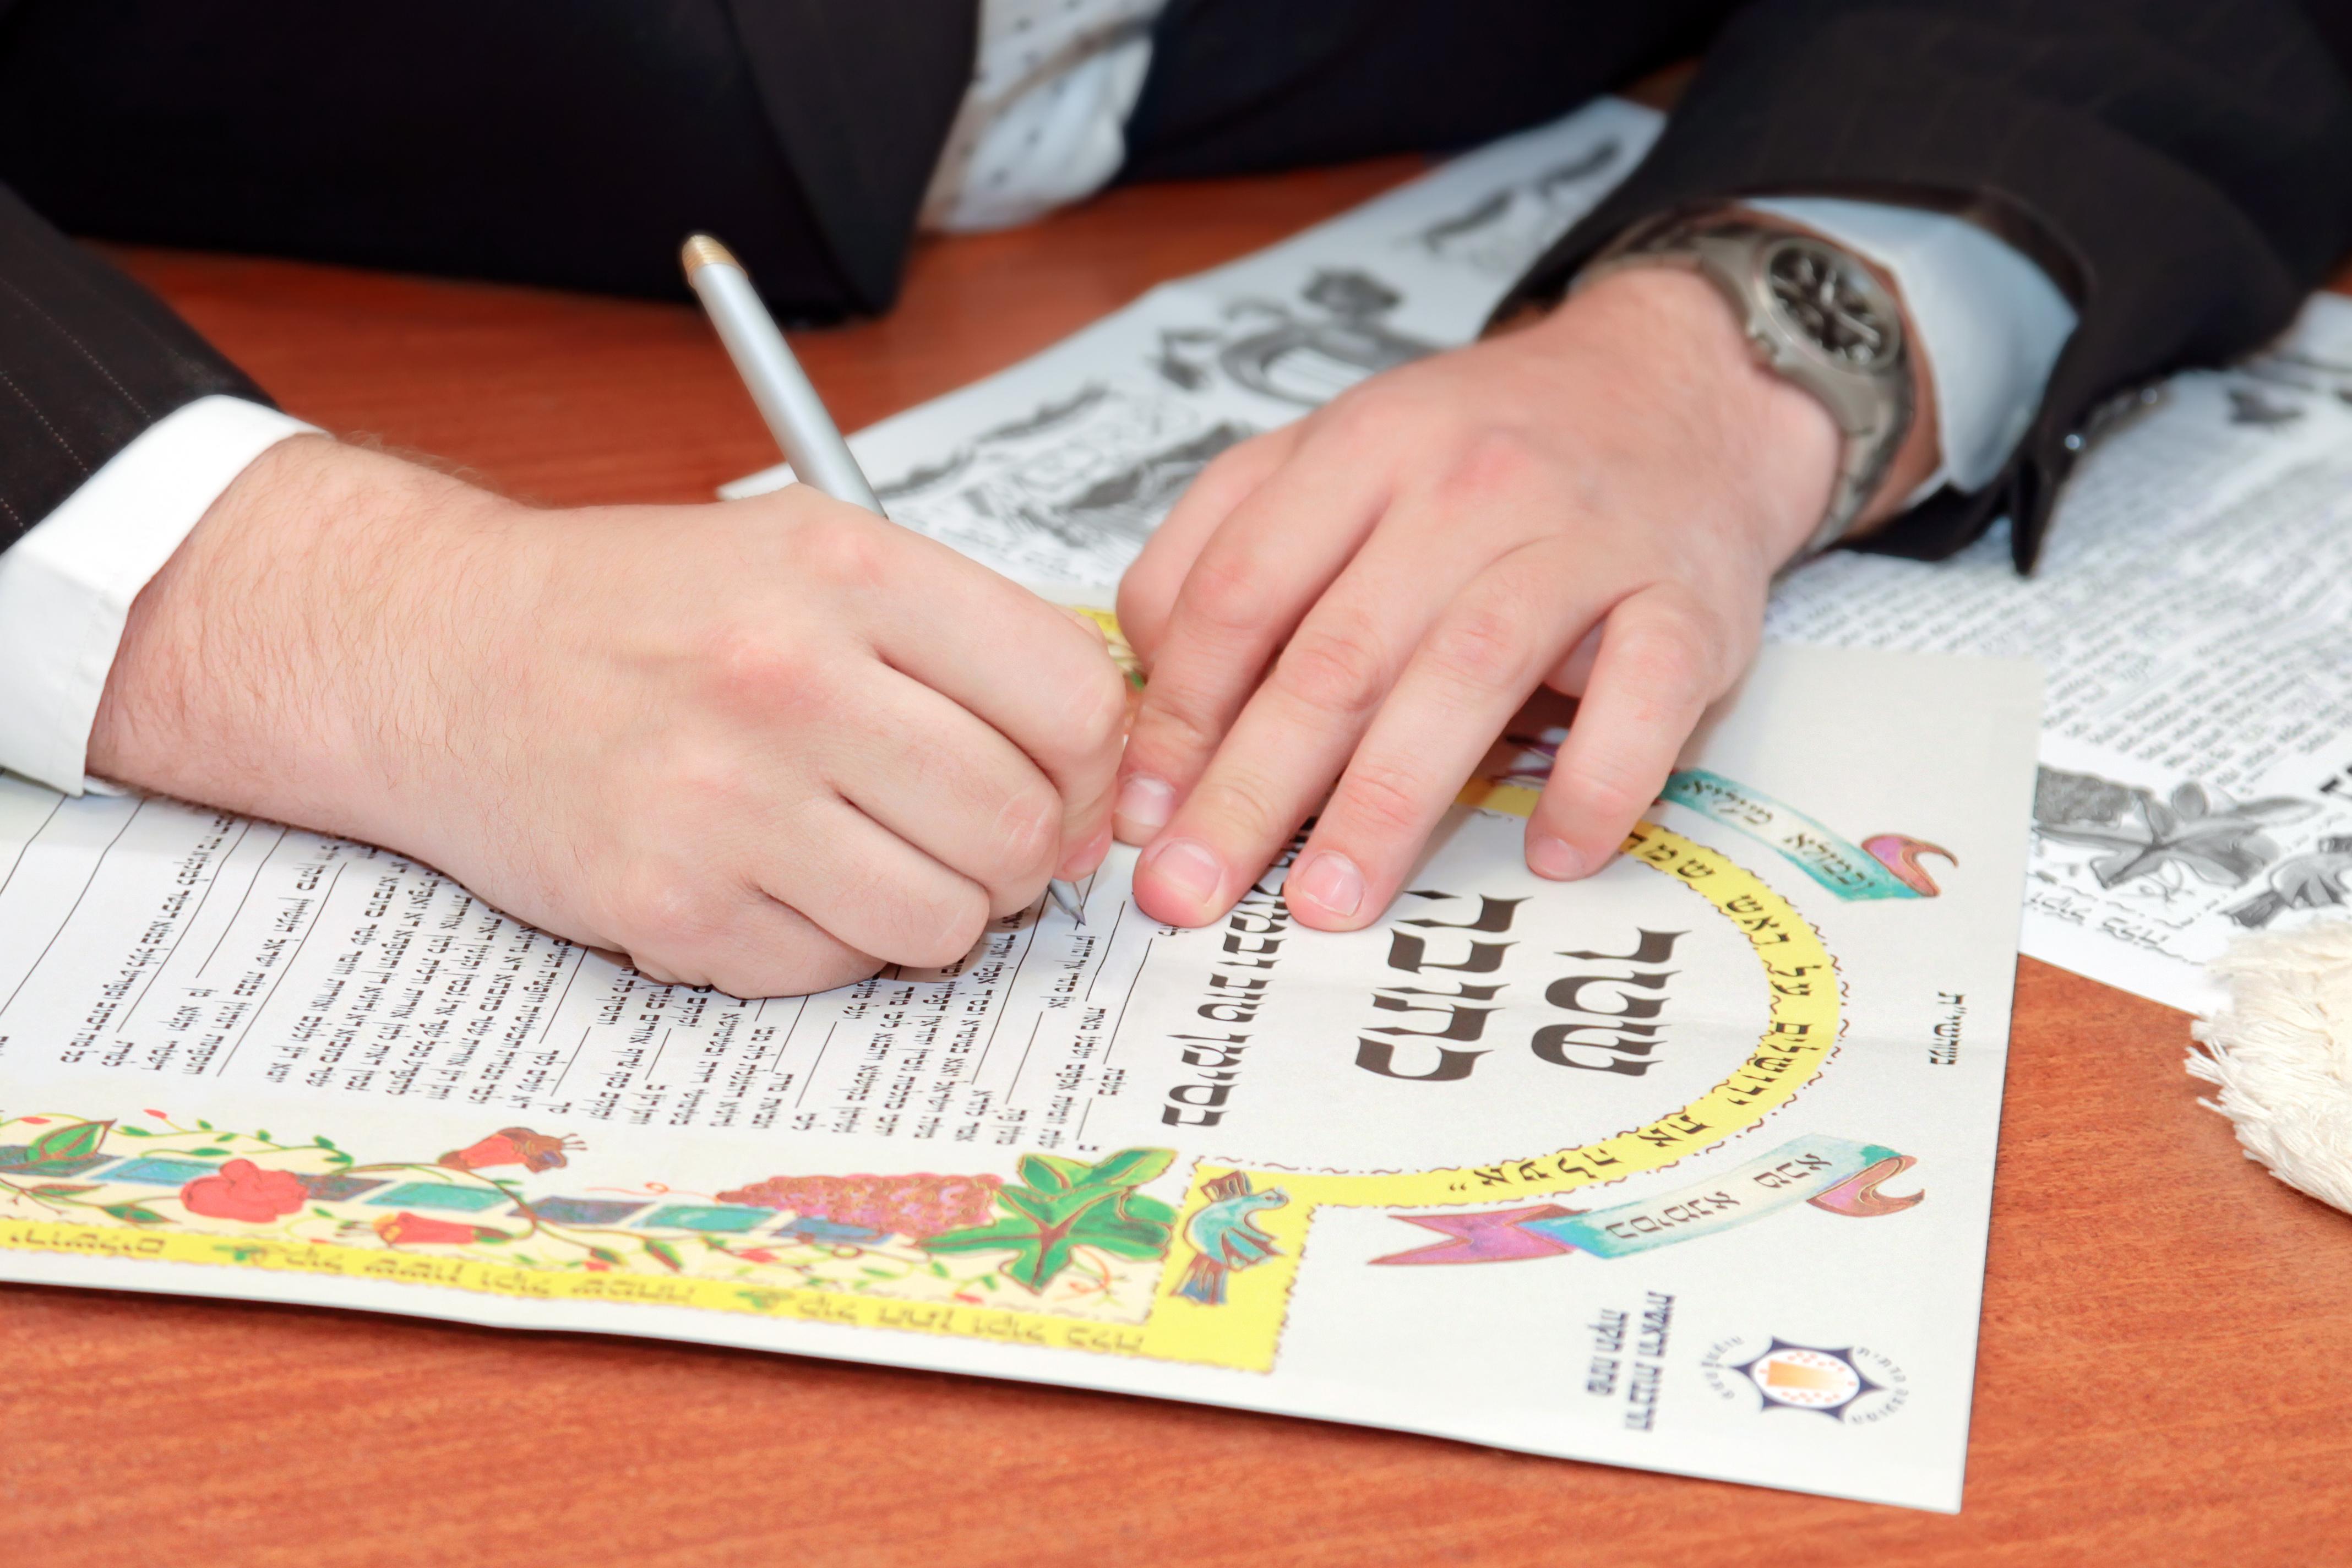 Jewish wedding, signing prenuptial agreement ketubah